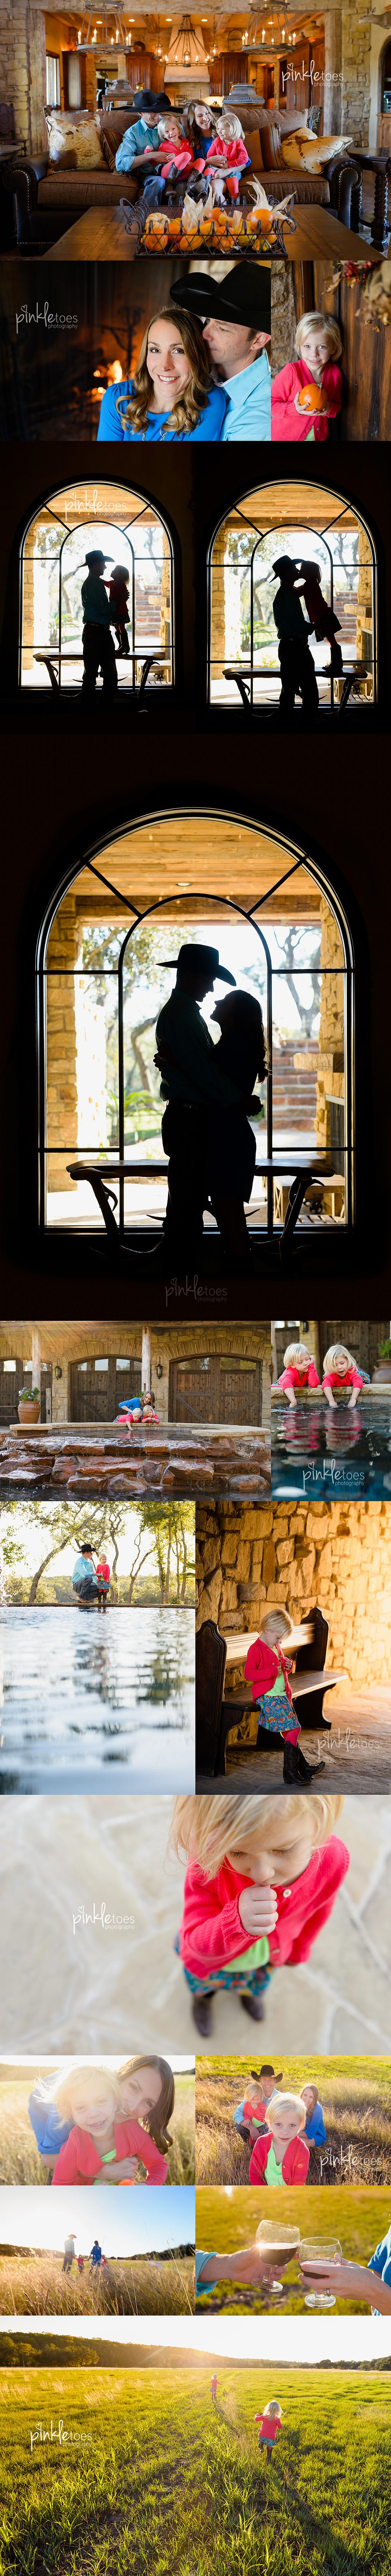 dripping-springs-farm-texas-family-photo-shoot-ranch-home-austin